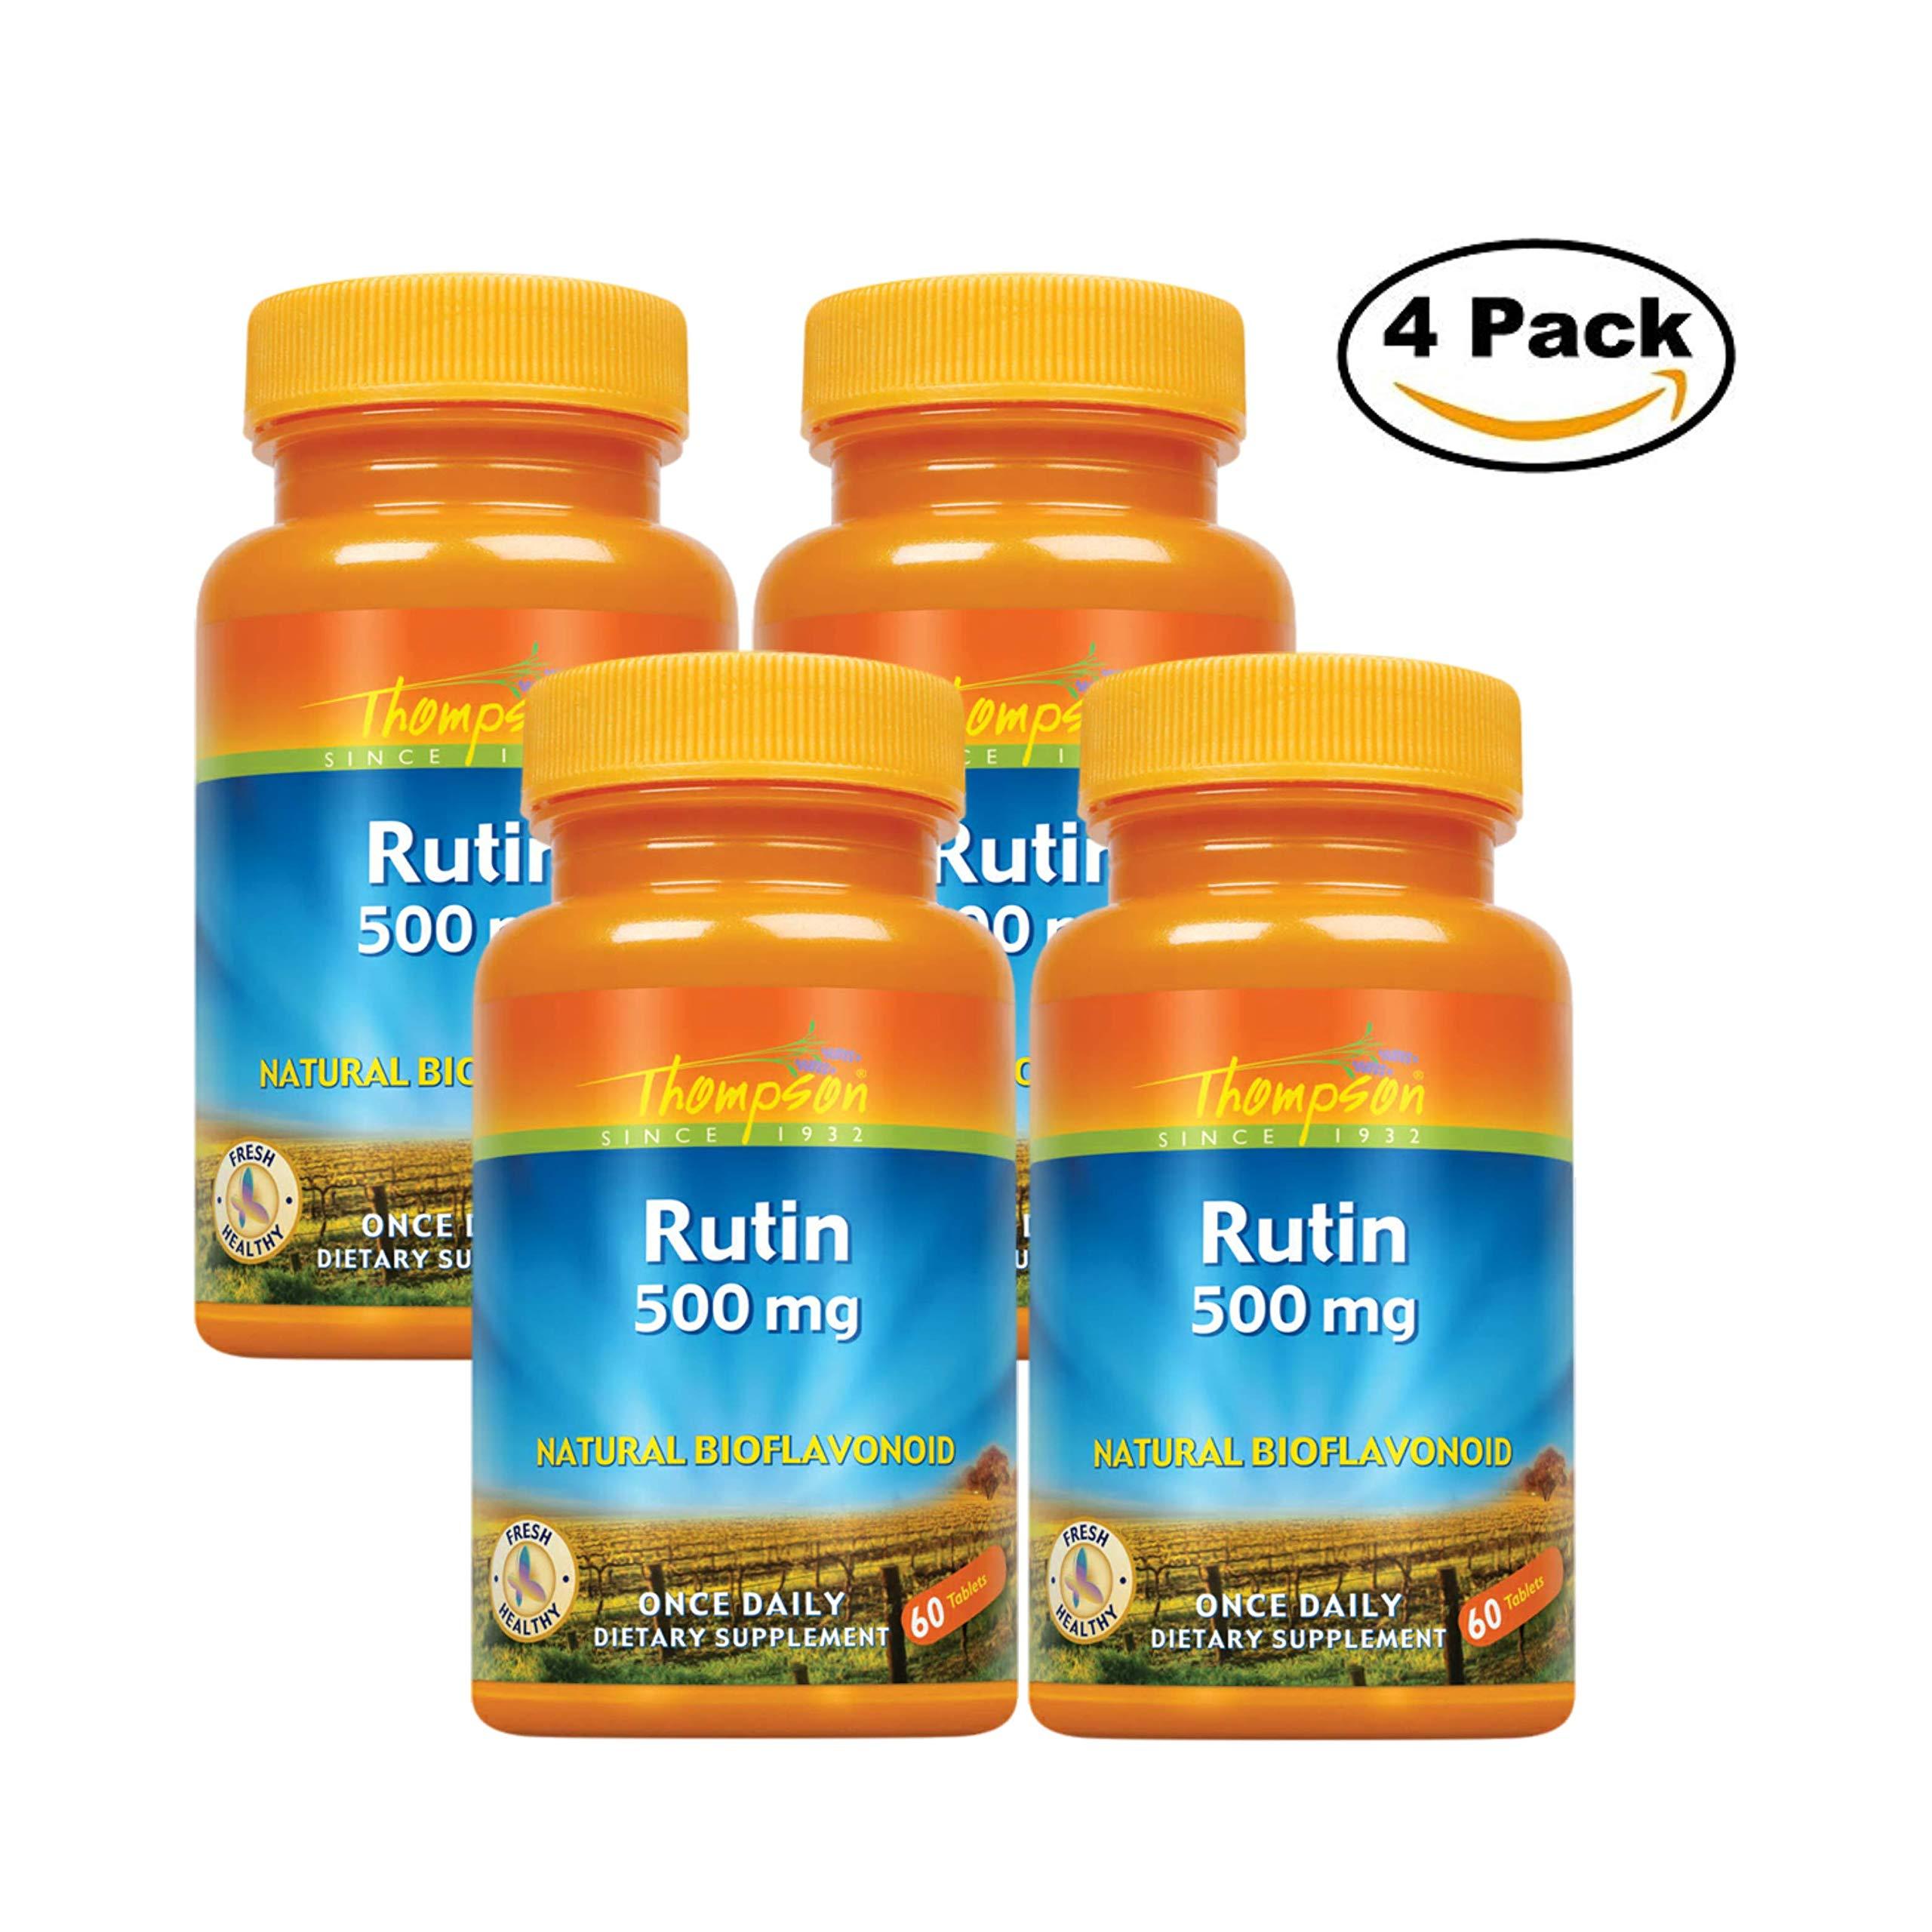 Thompson Rutin 500 mg, 60-Count (Pack of 4)